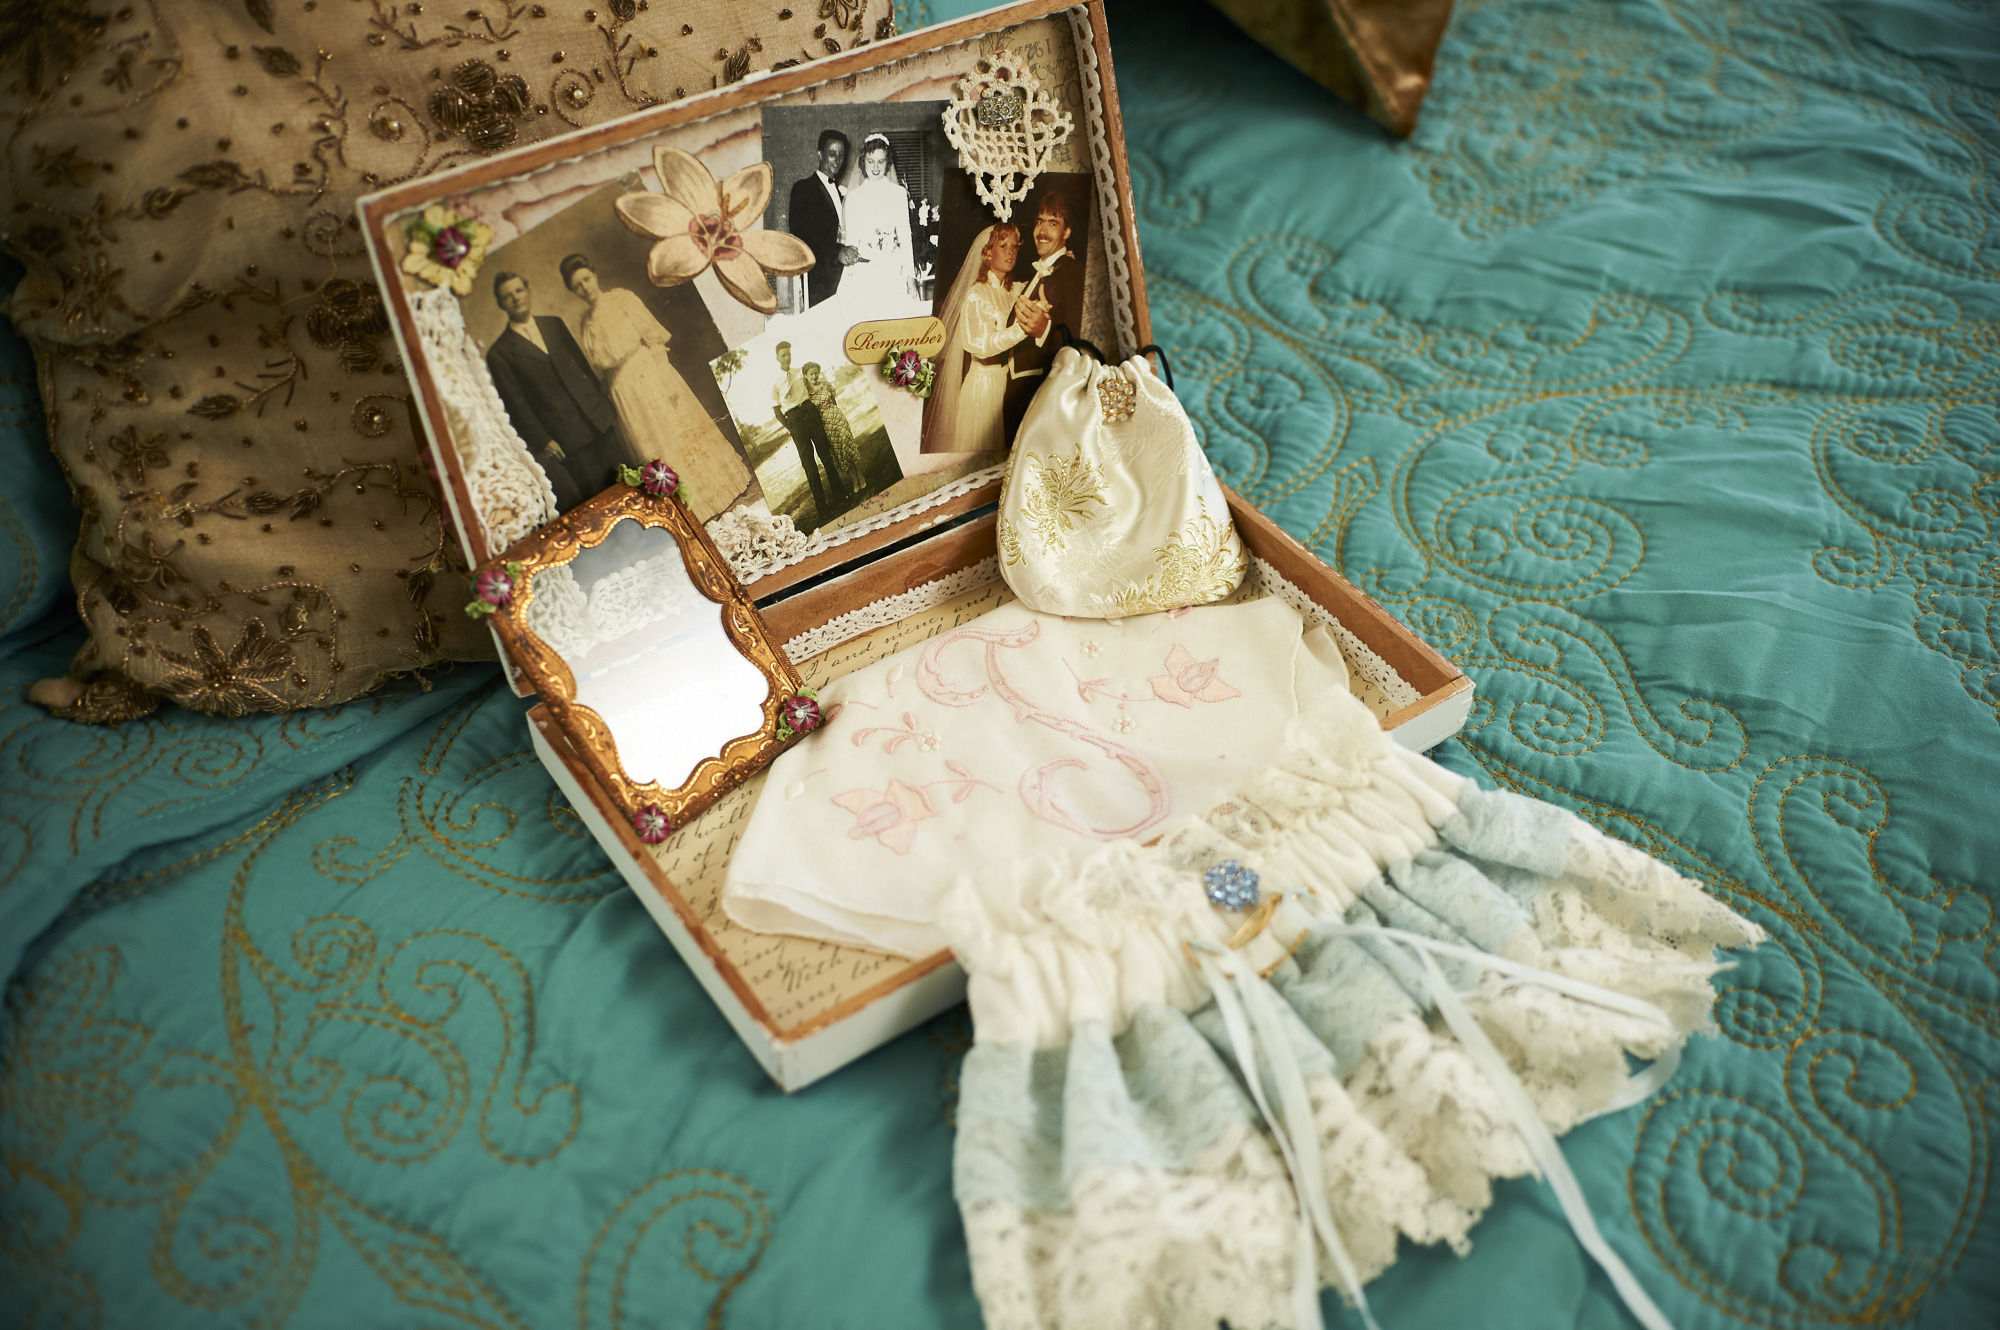 Taylor and Cody - Taylor Mansion and Crystal Ball Room - Taylor Texas - Wedding - 001